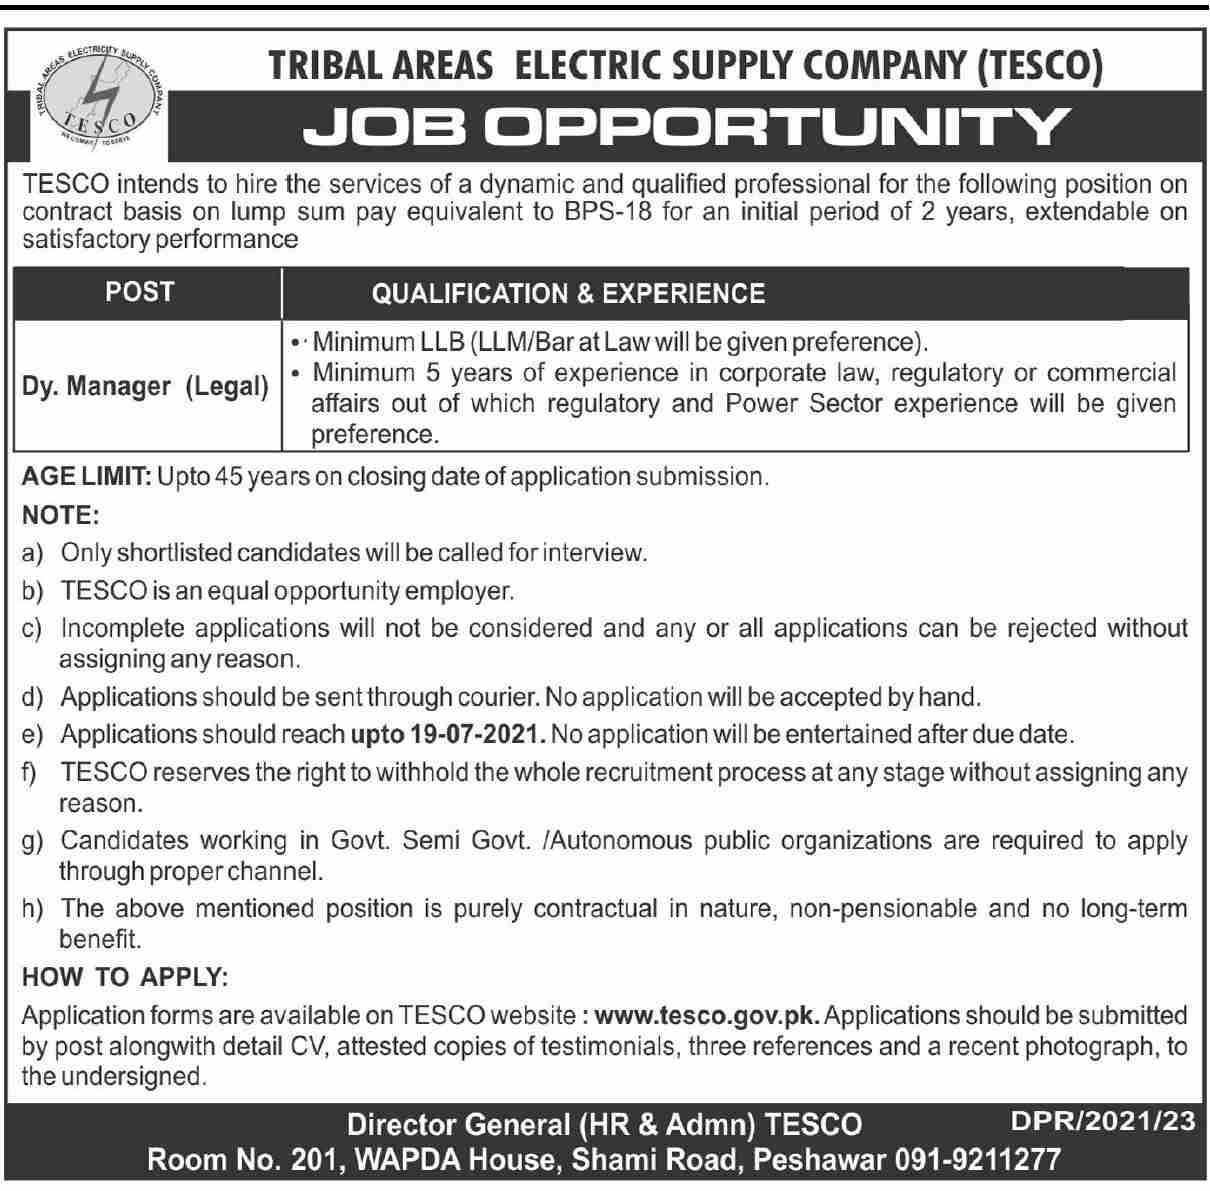 TESCO Jobs 2021 Tribal Area Electric Supply Company